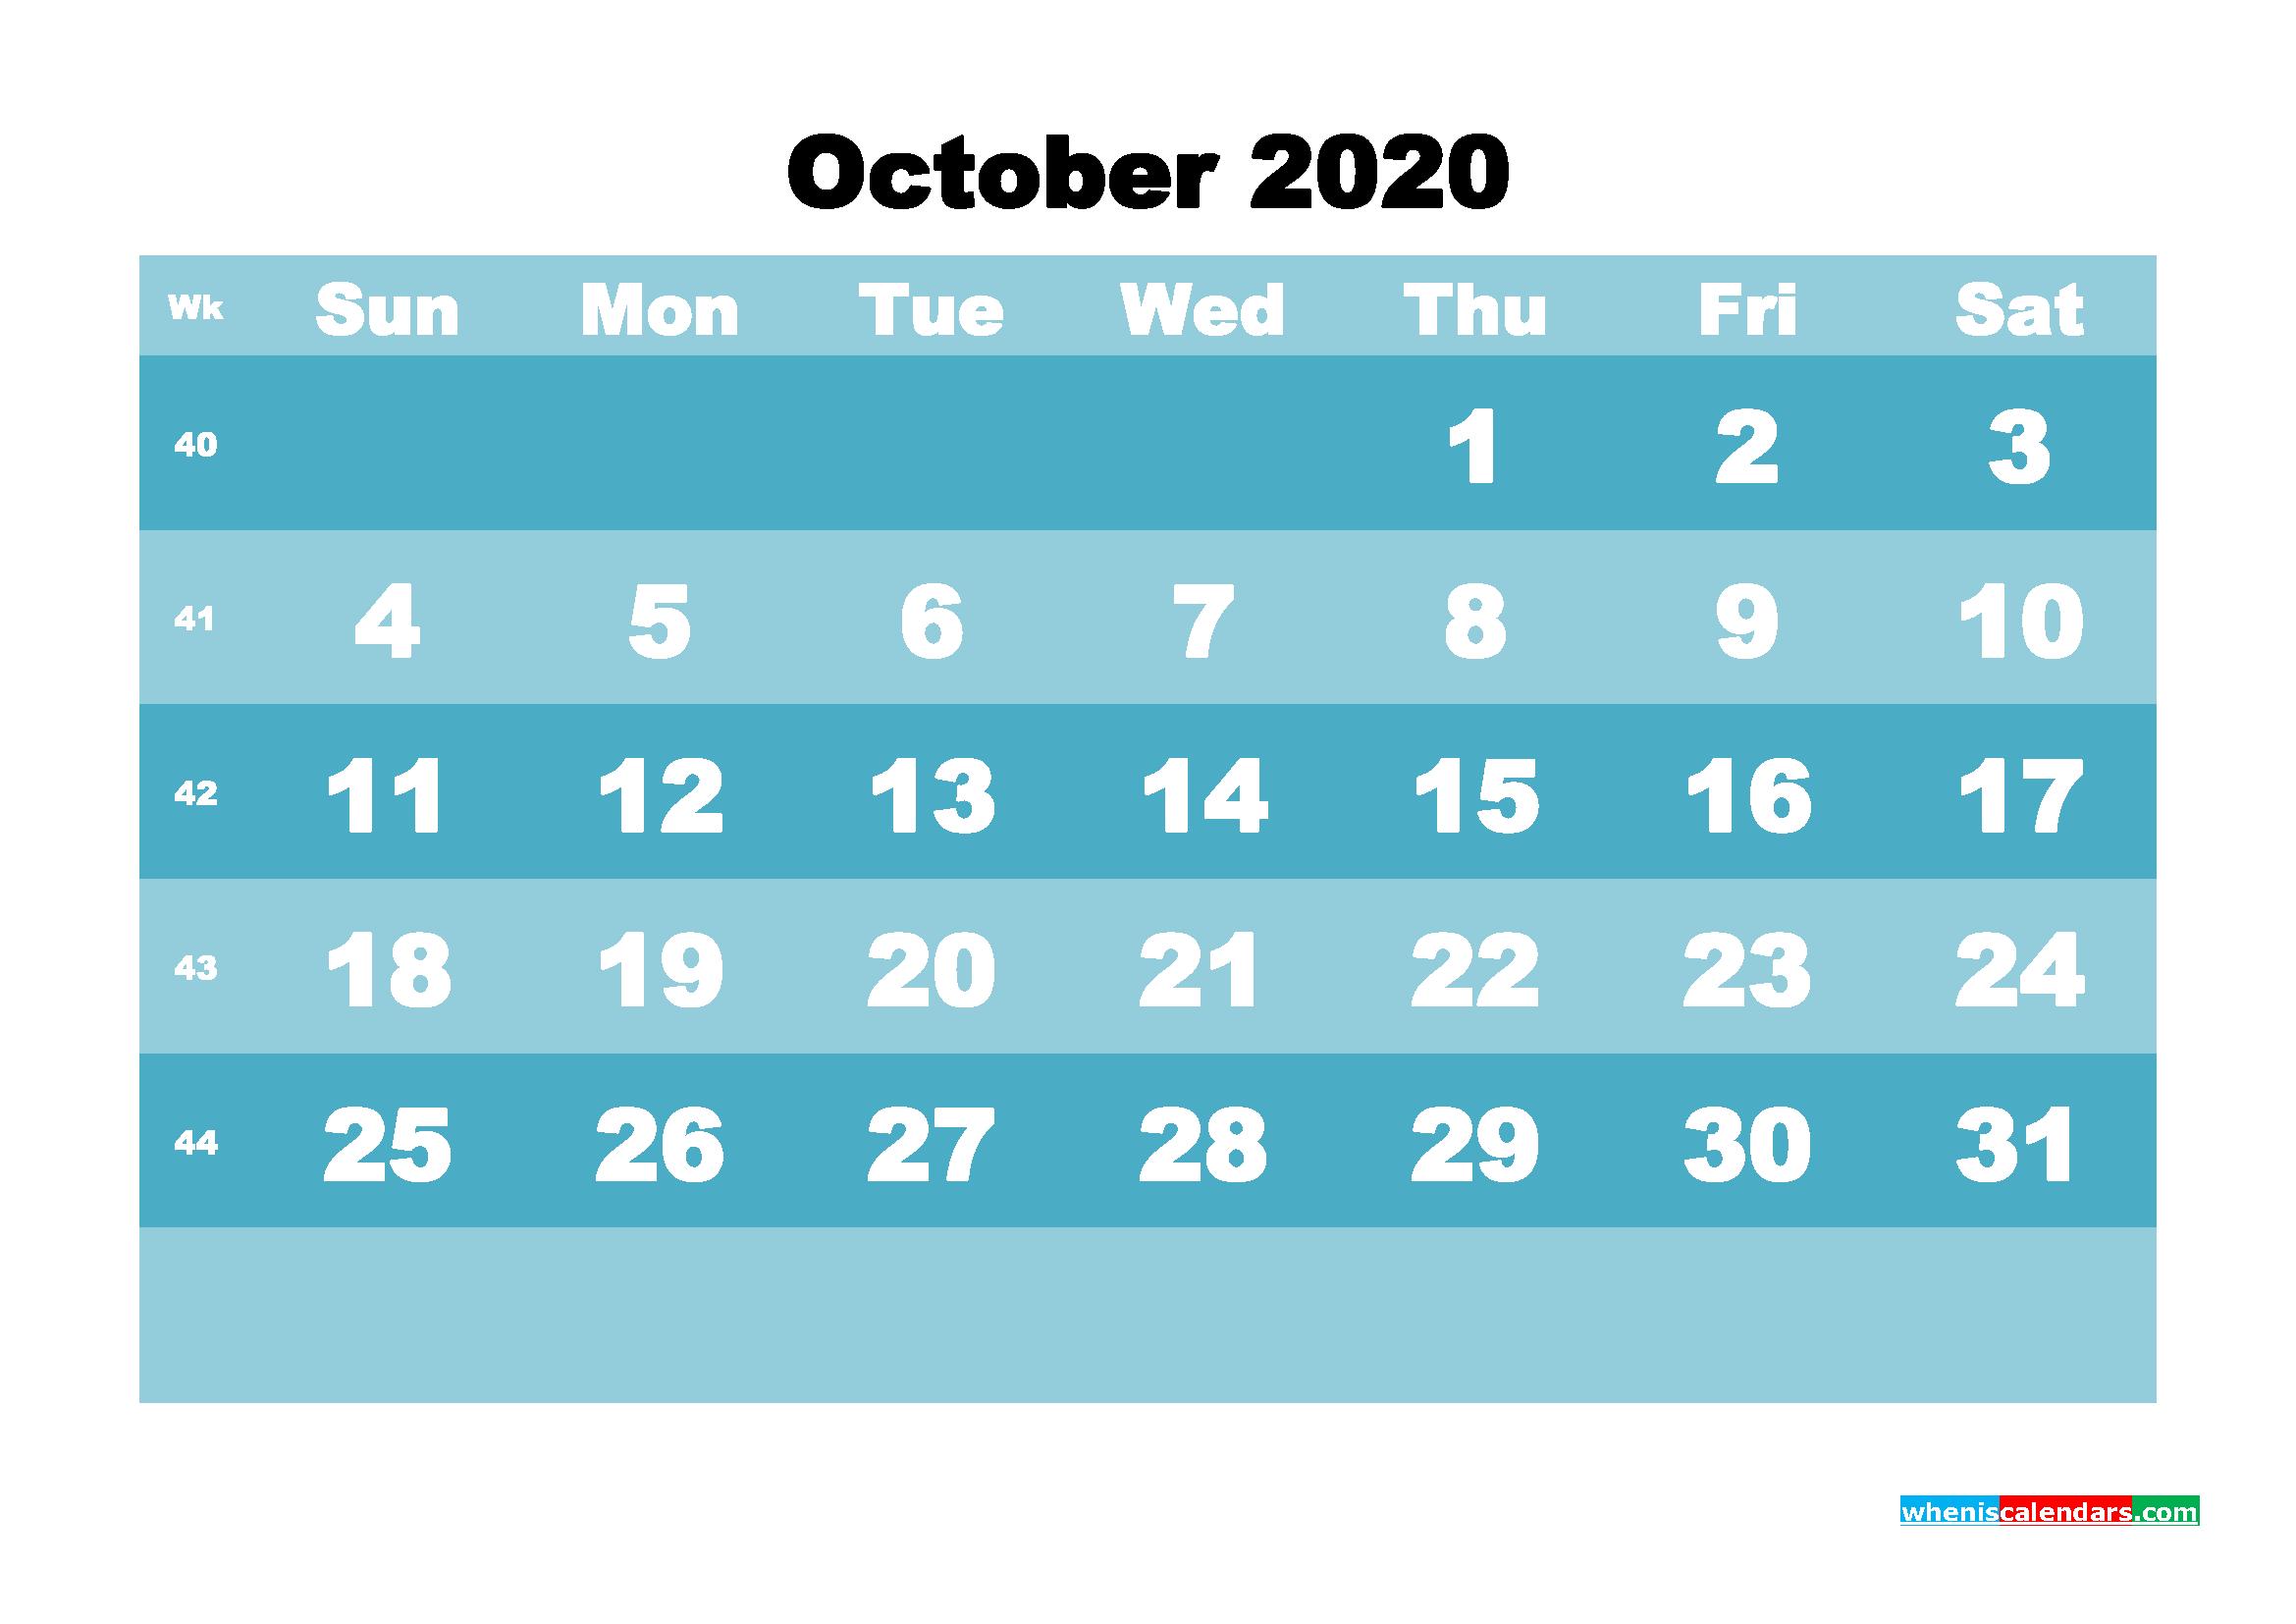 October 2020 Blank Calendar Printable - No.m20b574